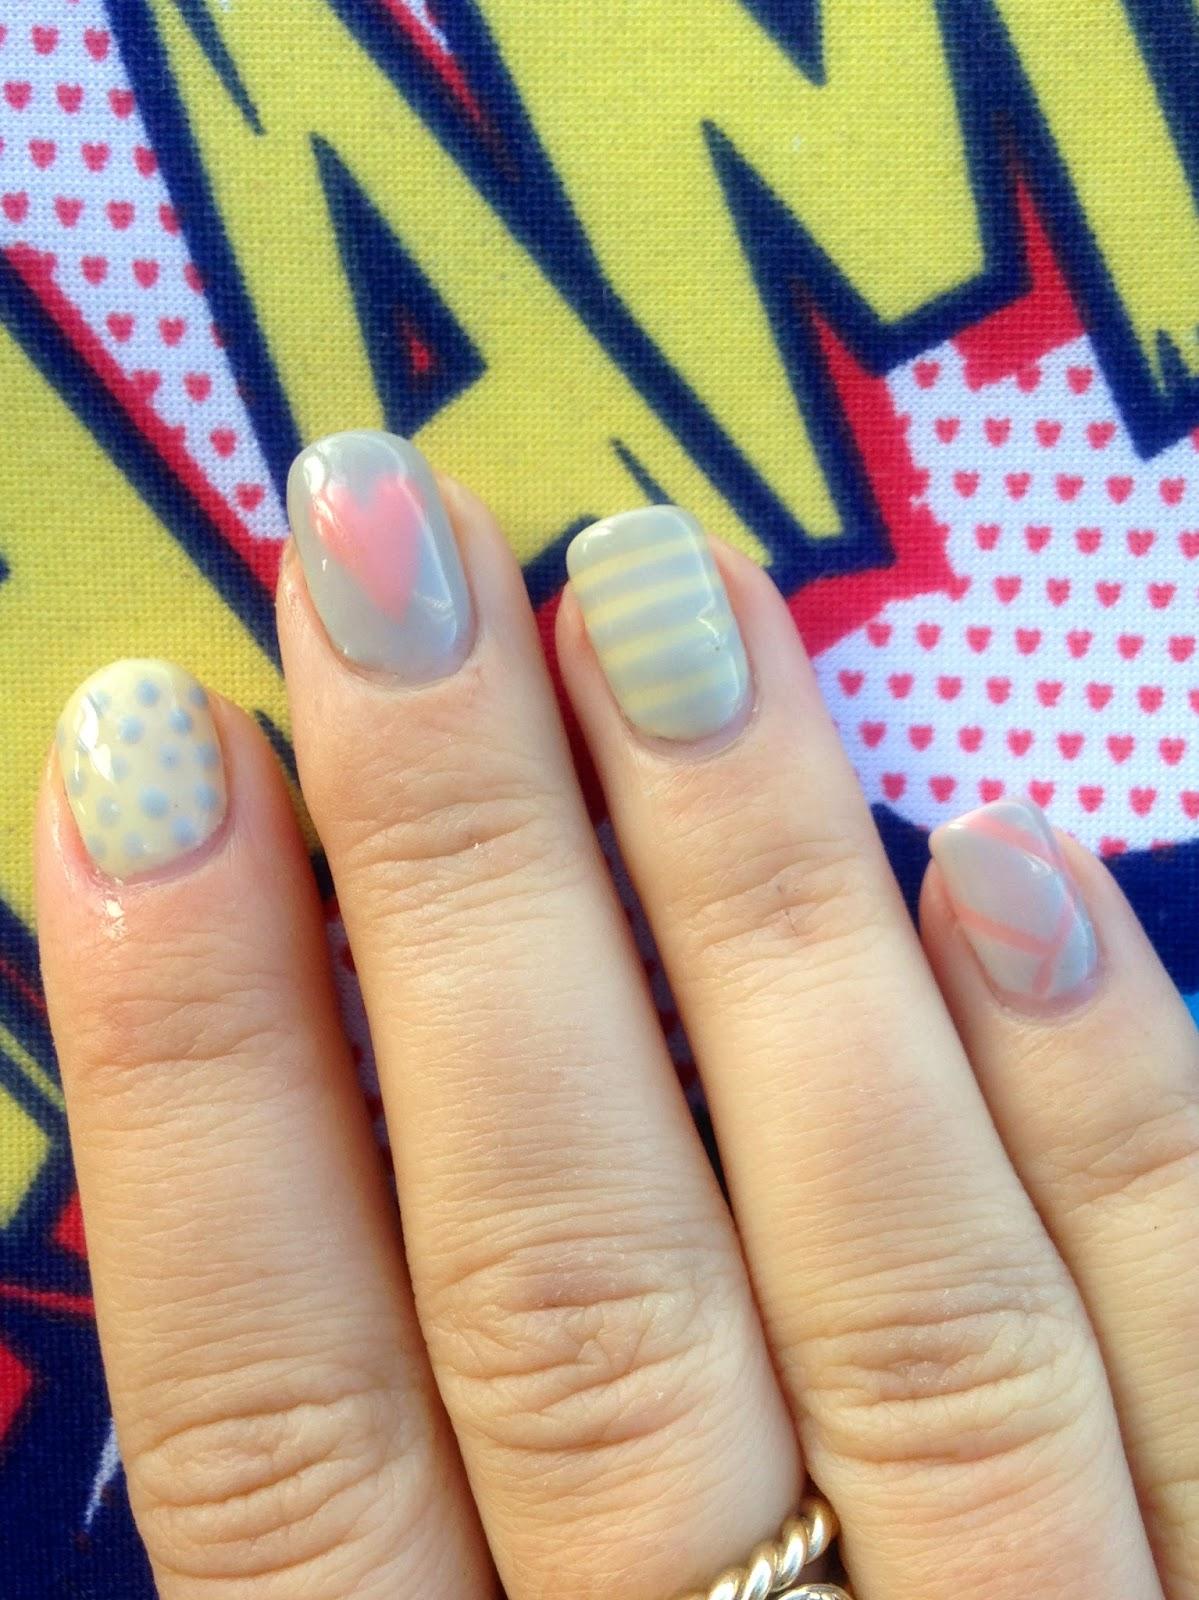 Gel before? Do you prefer regular nail polish or a gel system